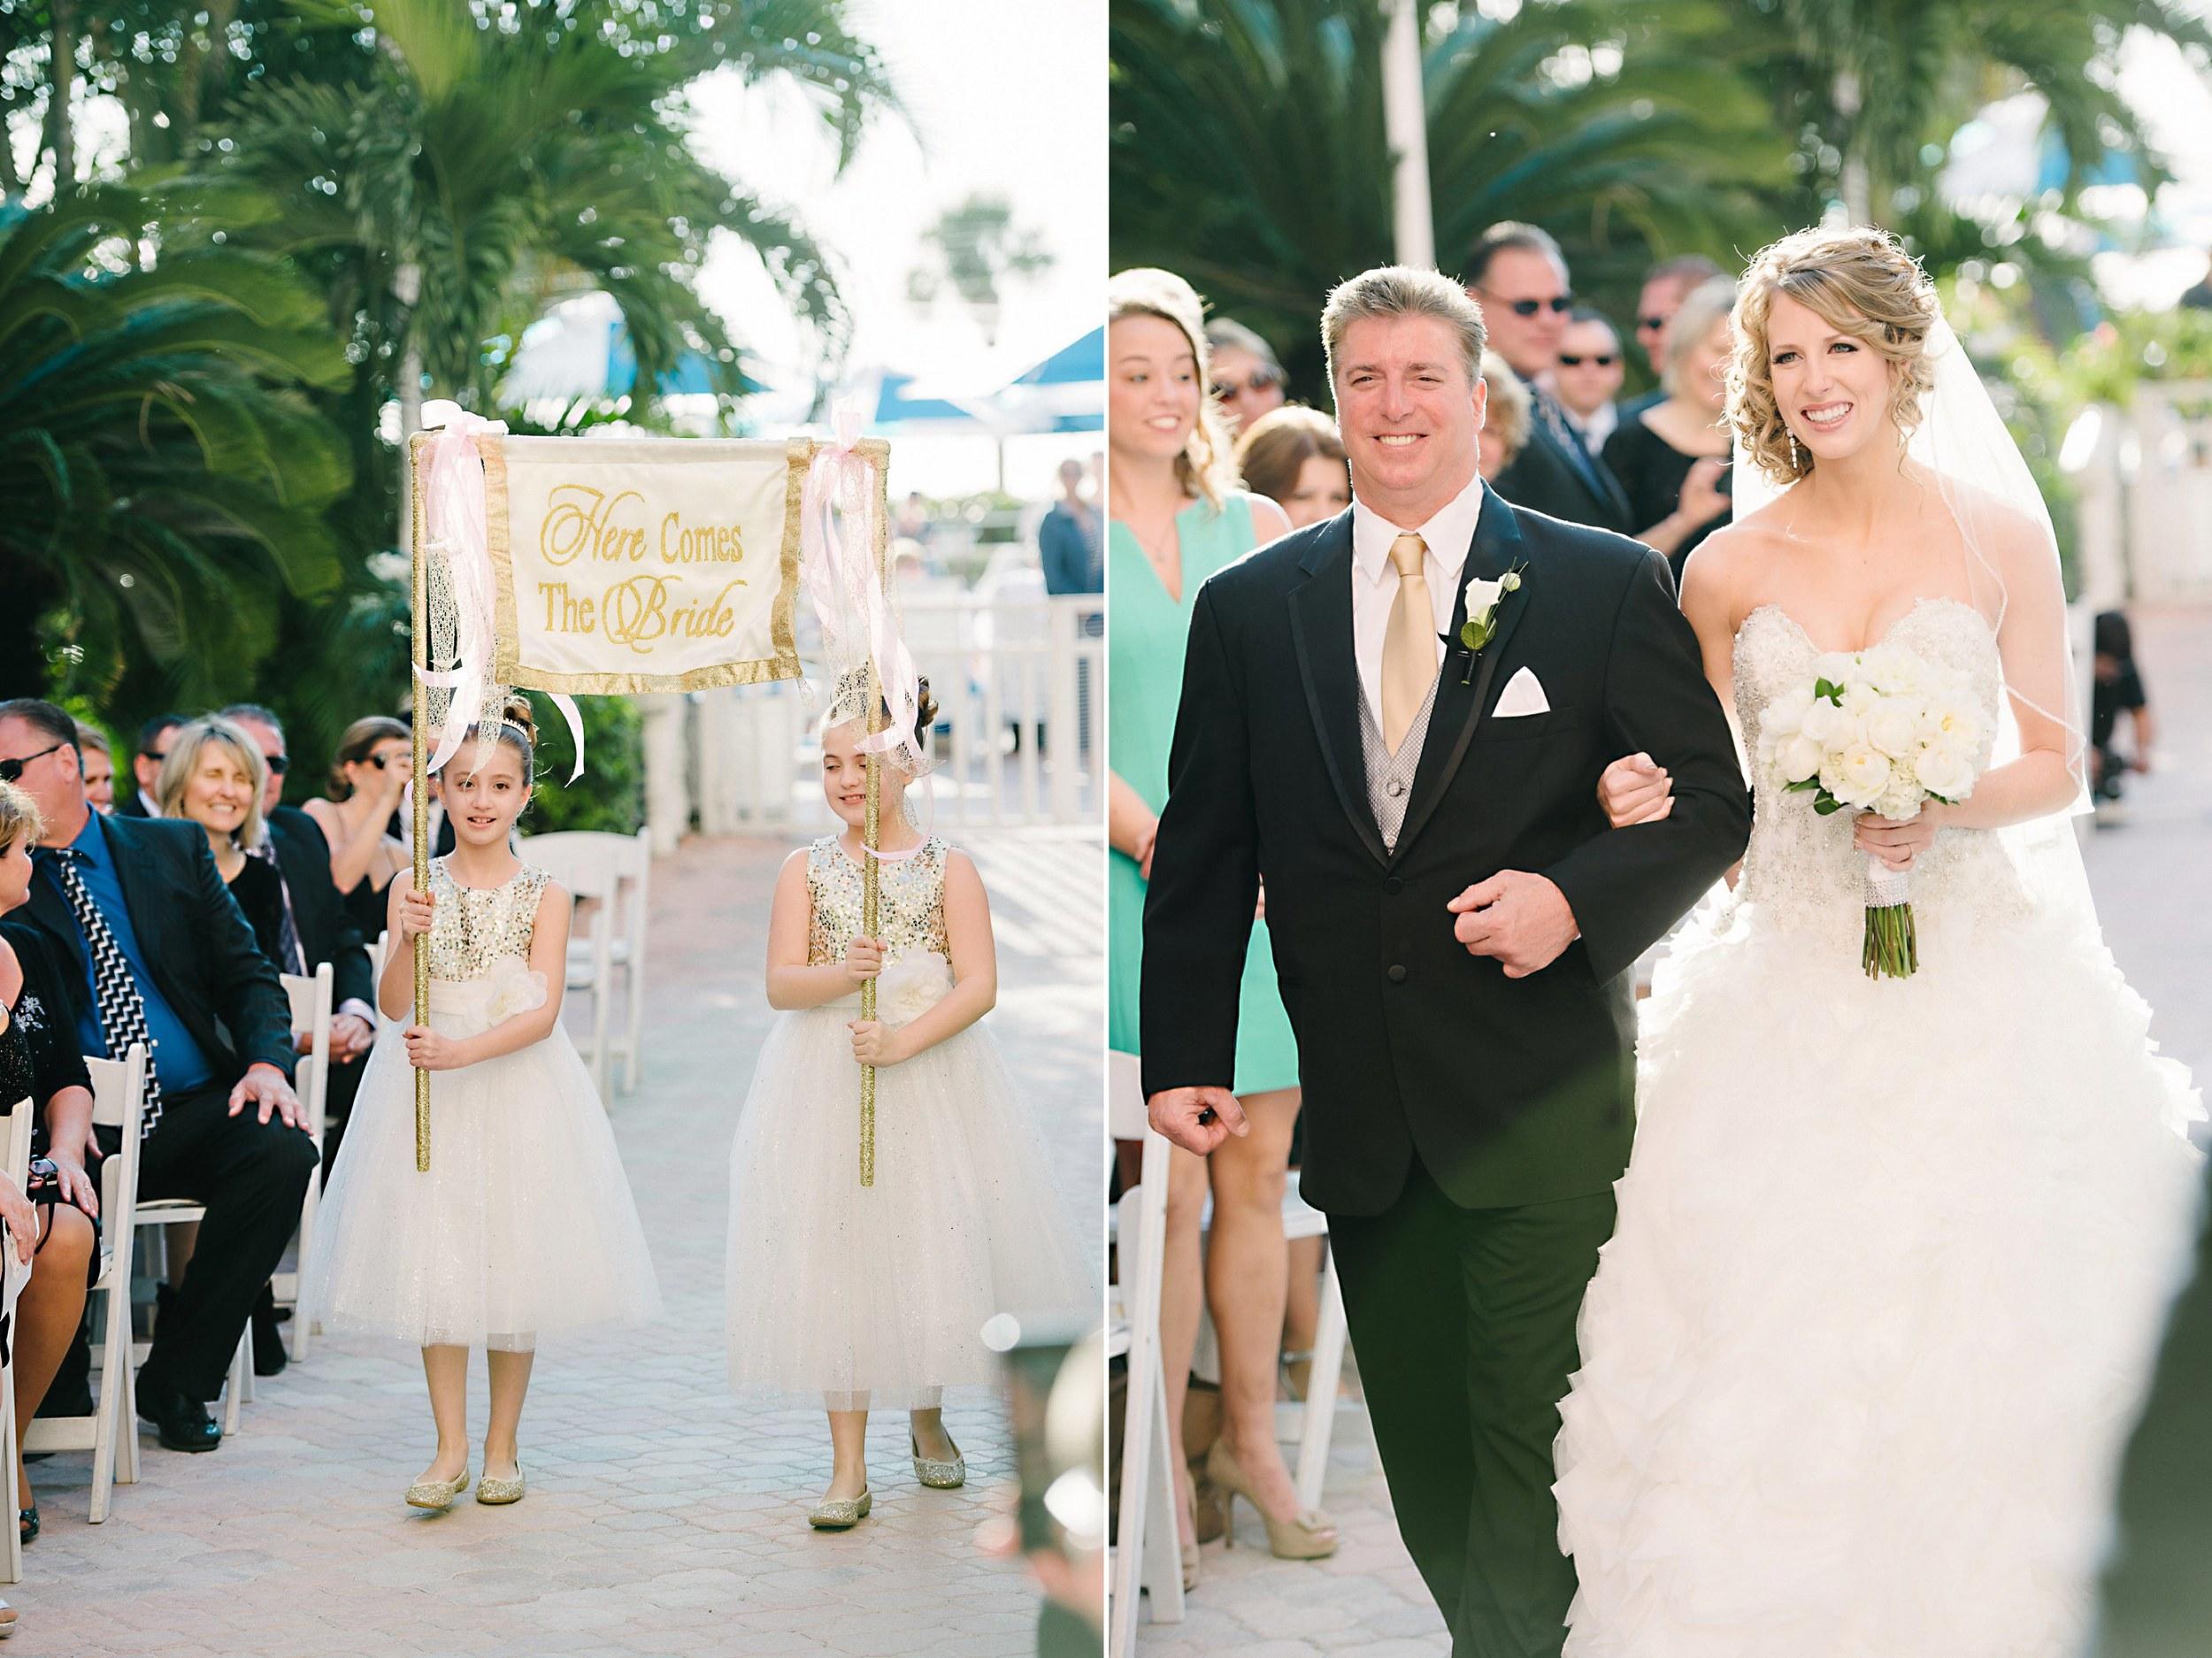 Cute Flower Girls Announcing Bride